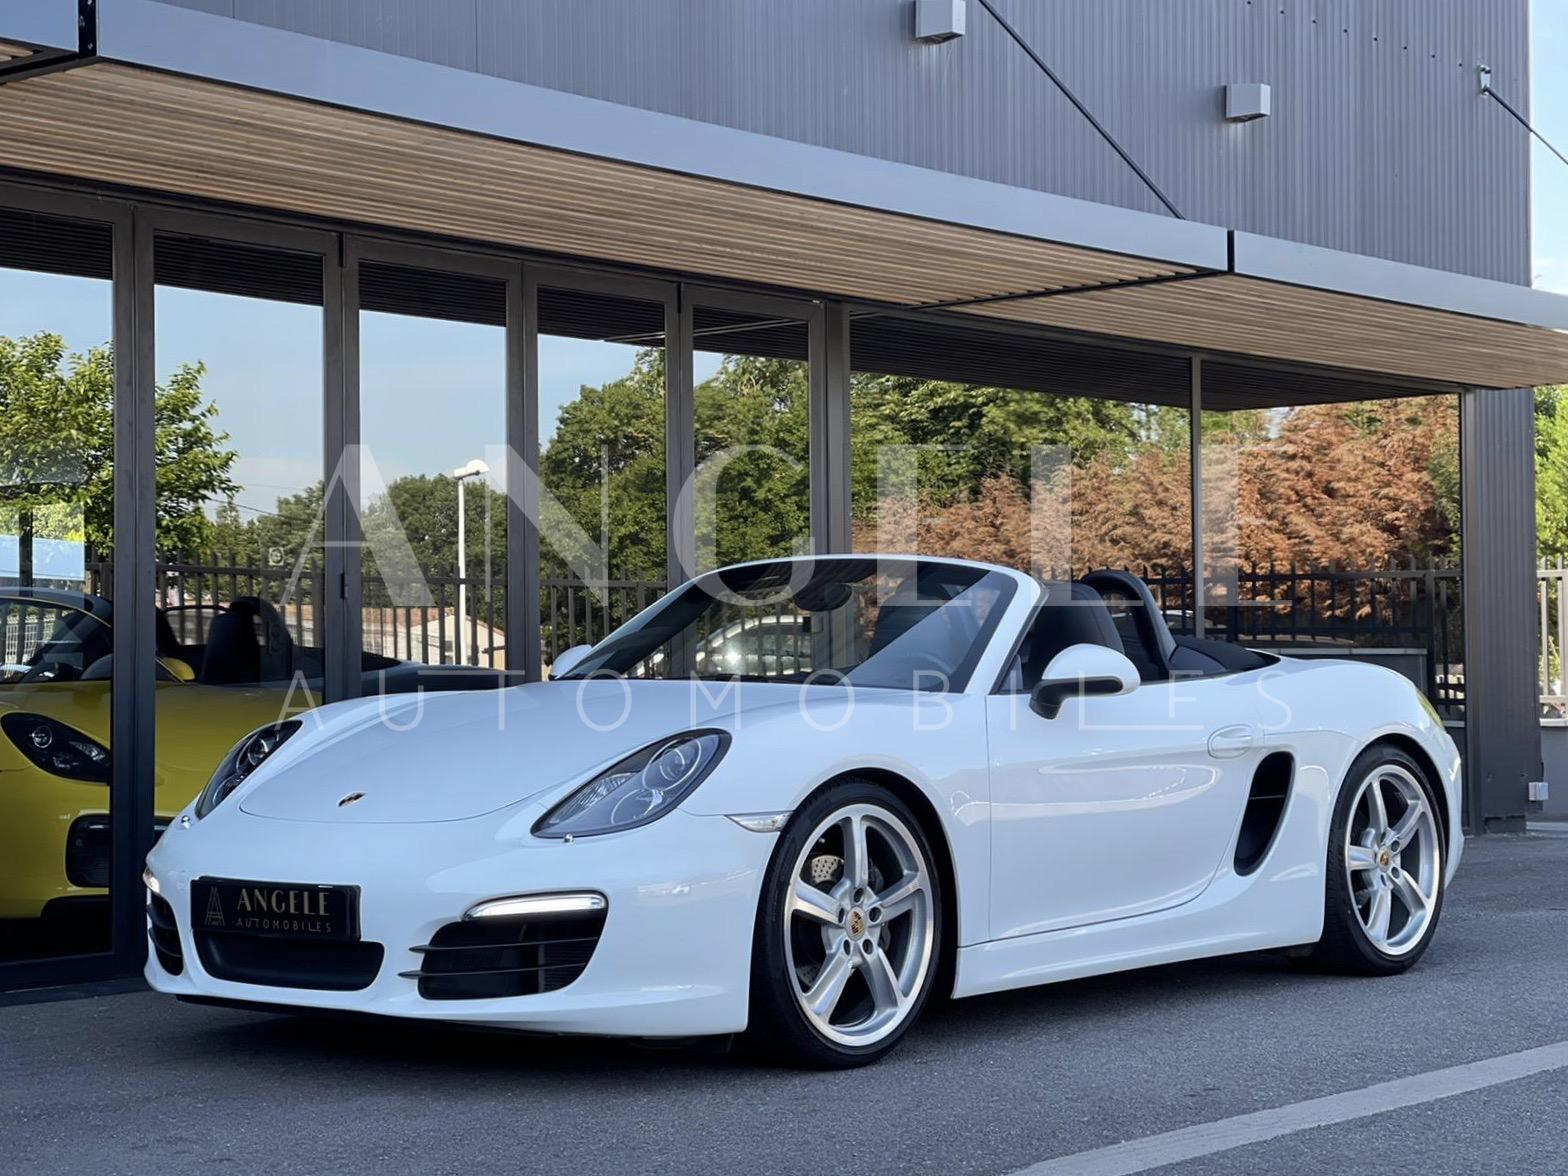 Porsche Boxster - ANGELE AUTOMOBILES